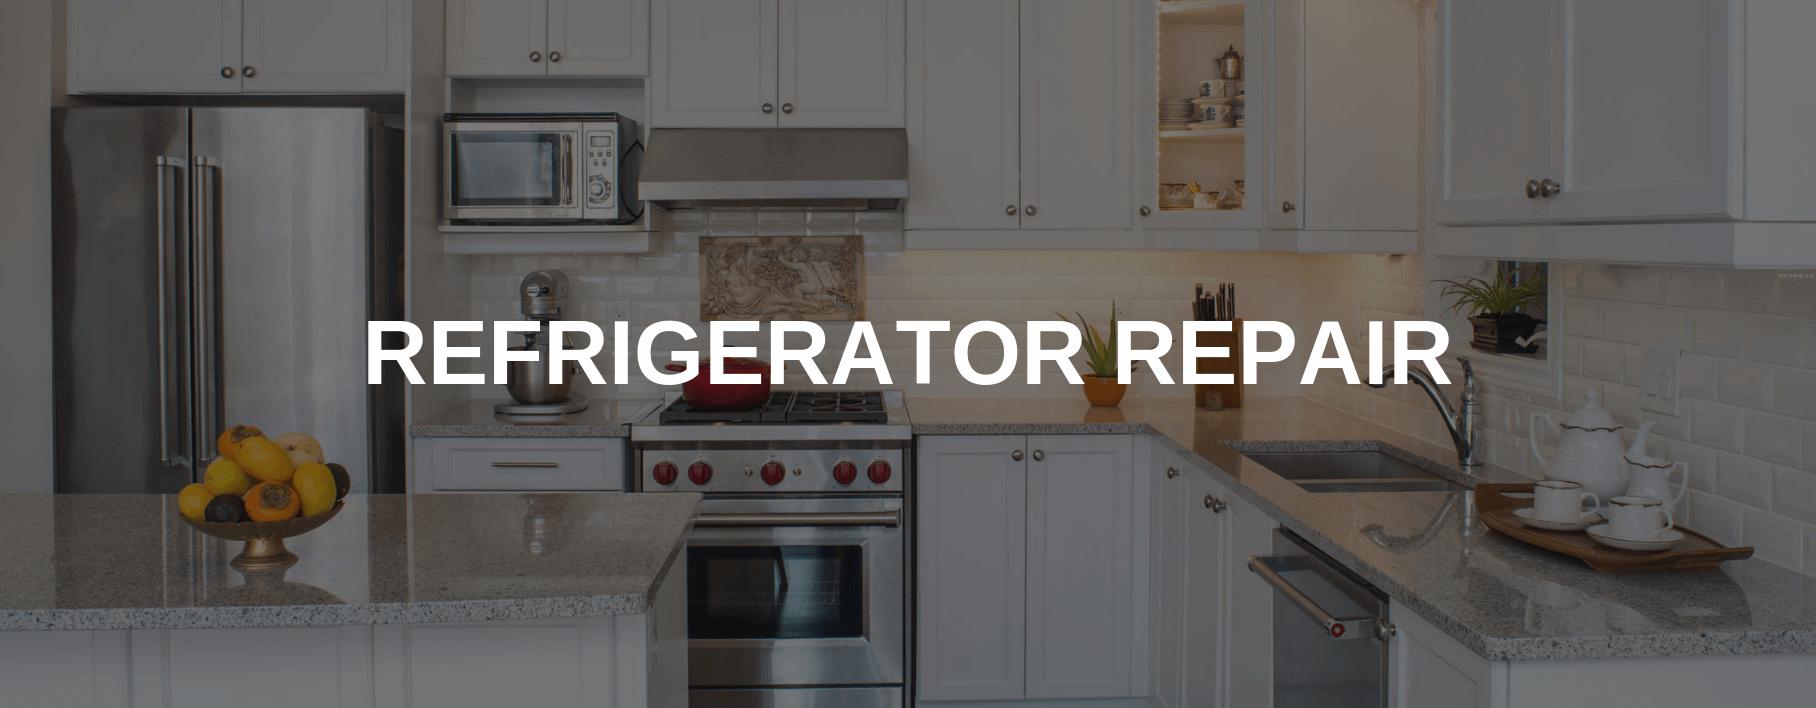 refrigerator repair enfield